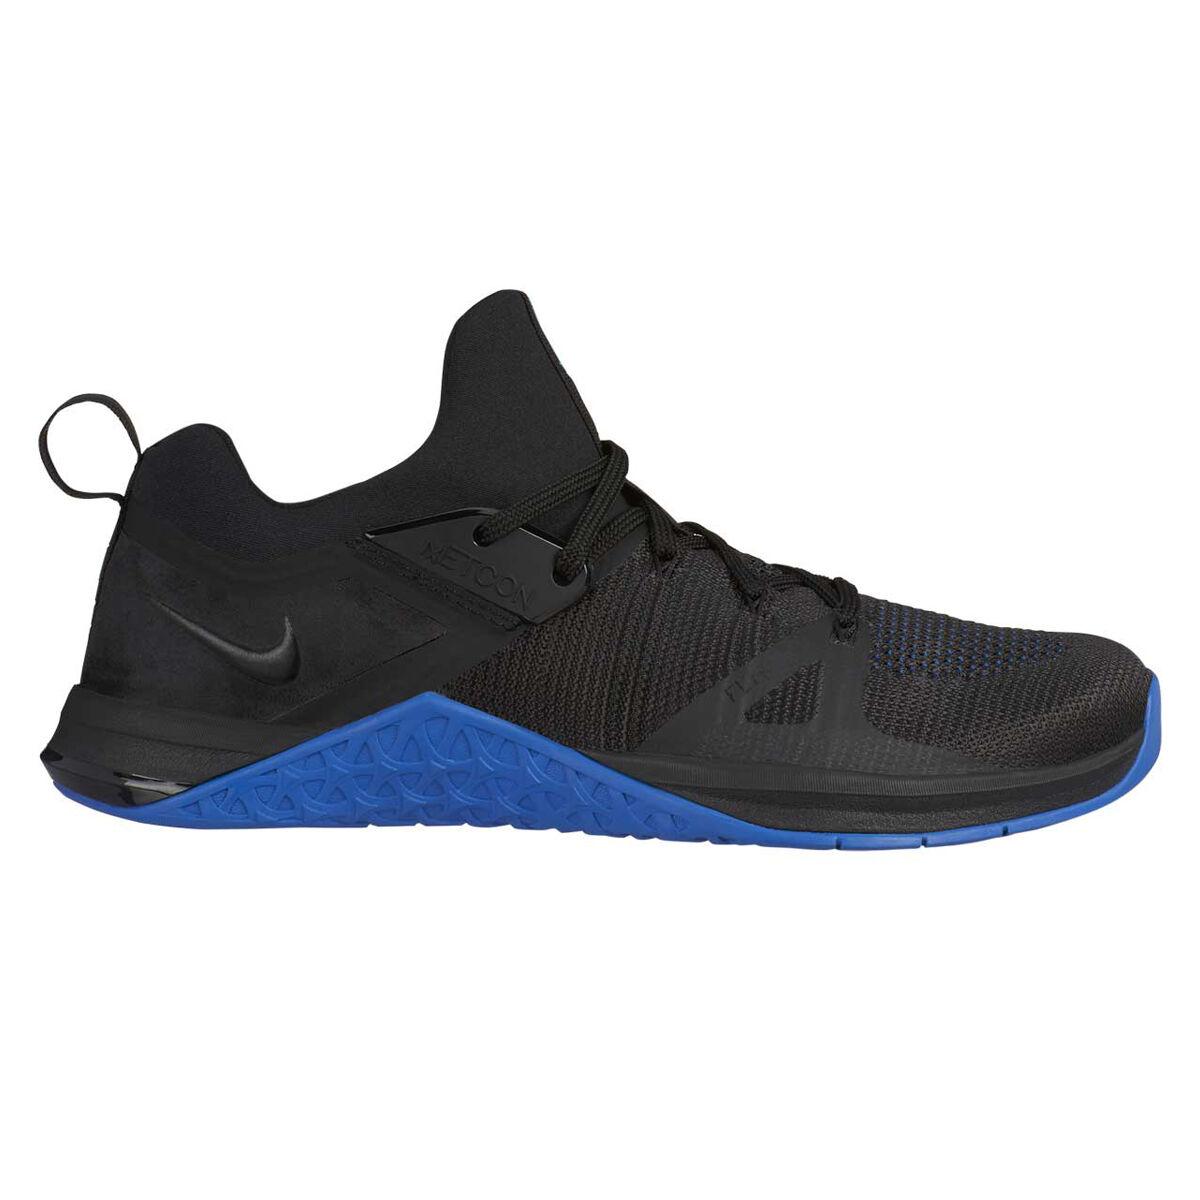 Nike Metcon Flyknit 3 Mens Training